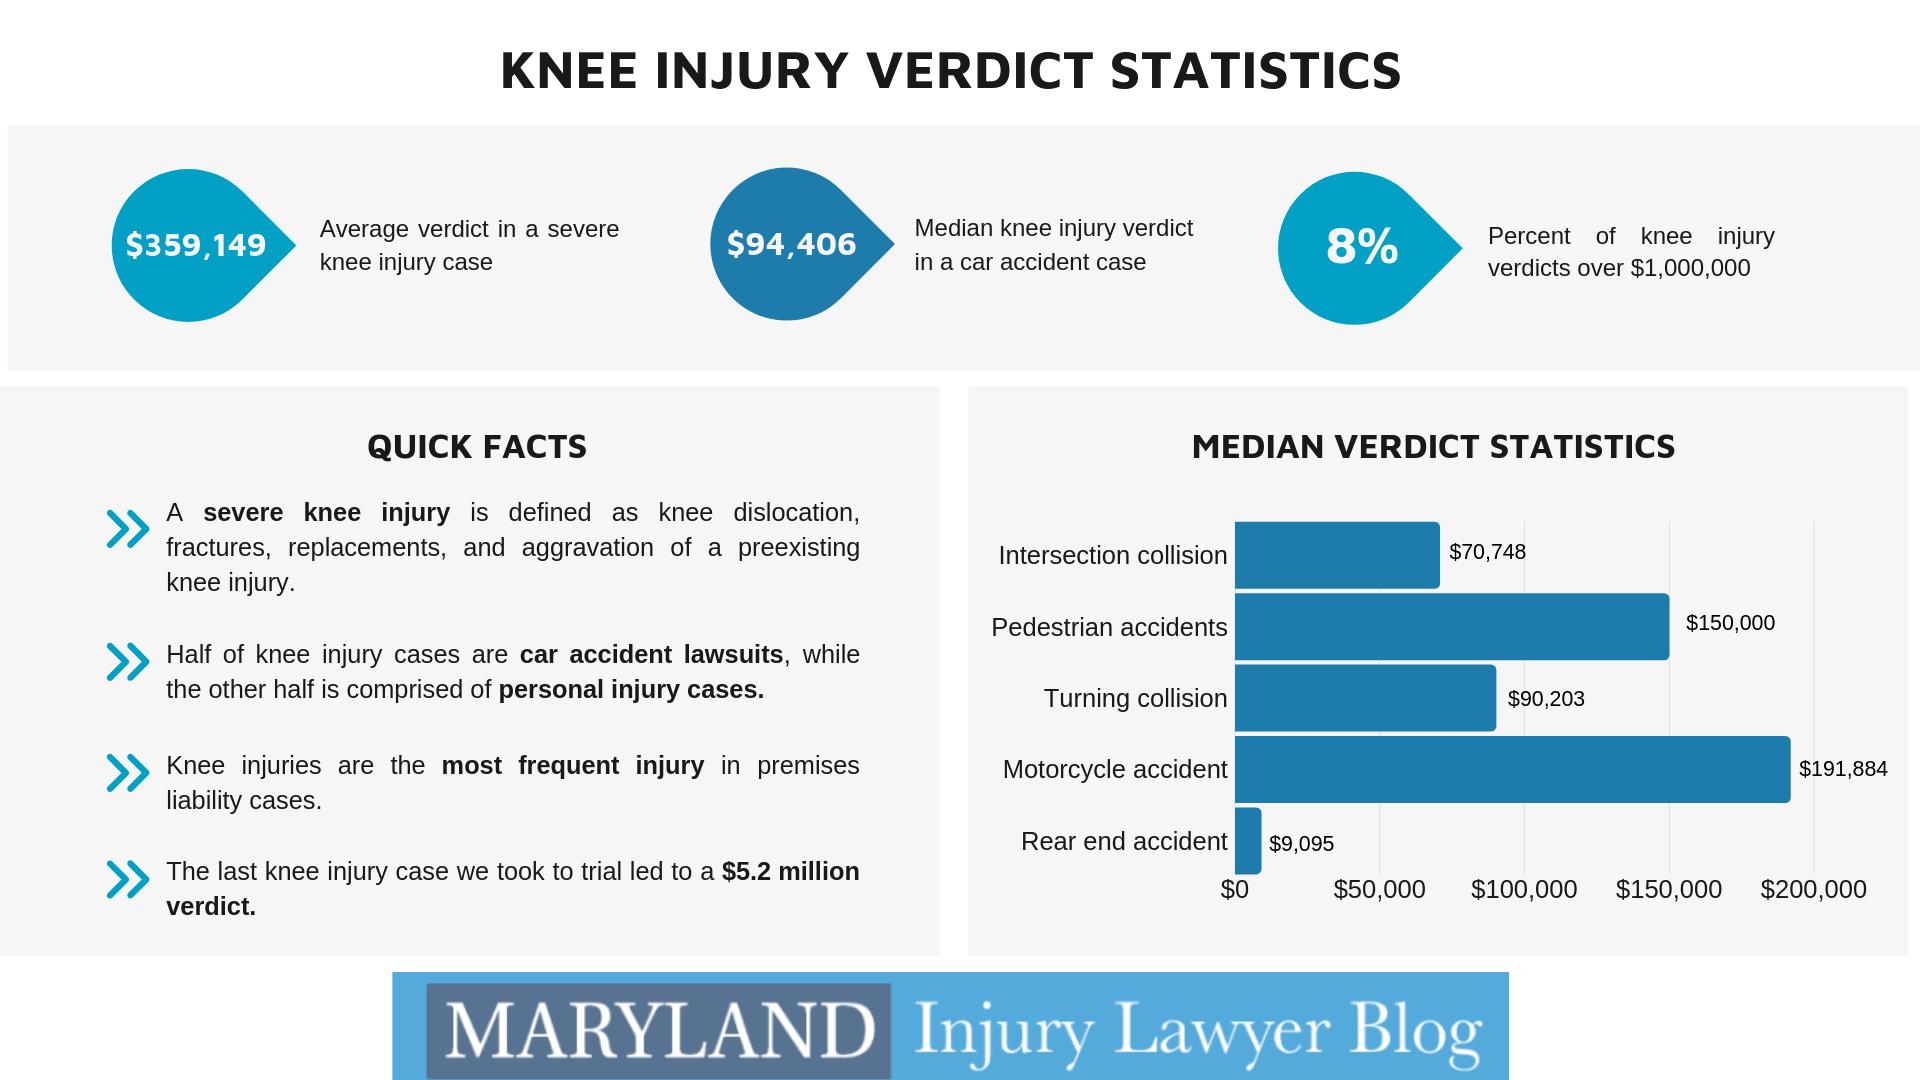 knee injury verdicts